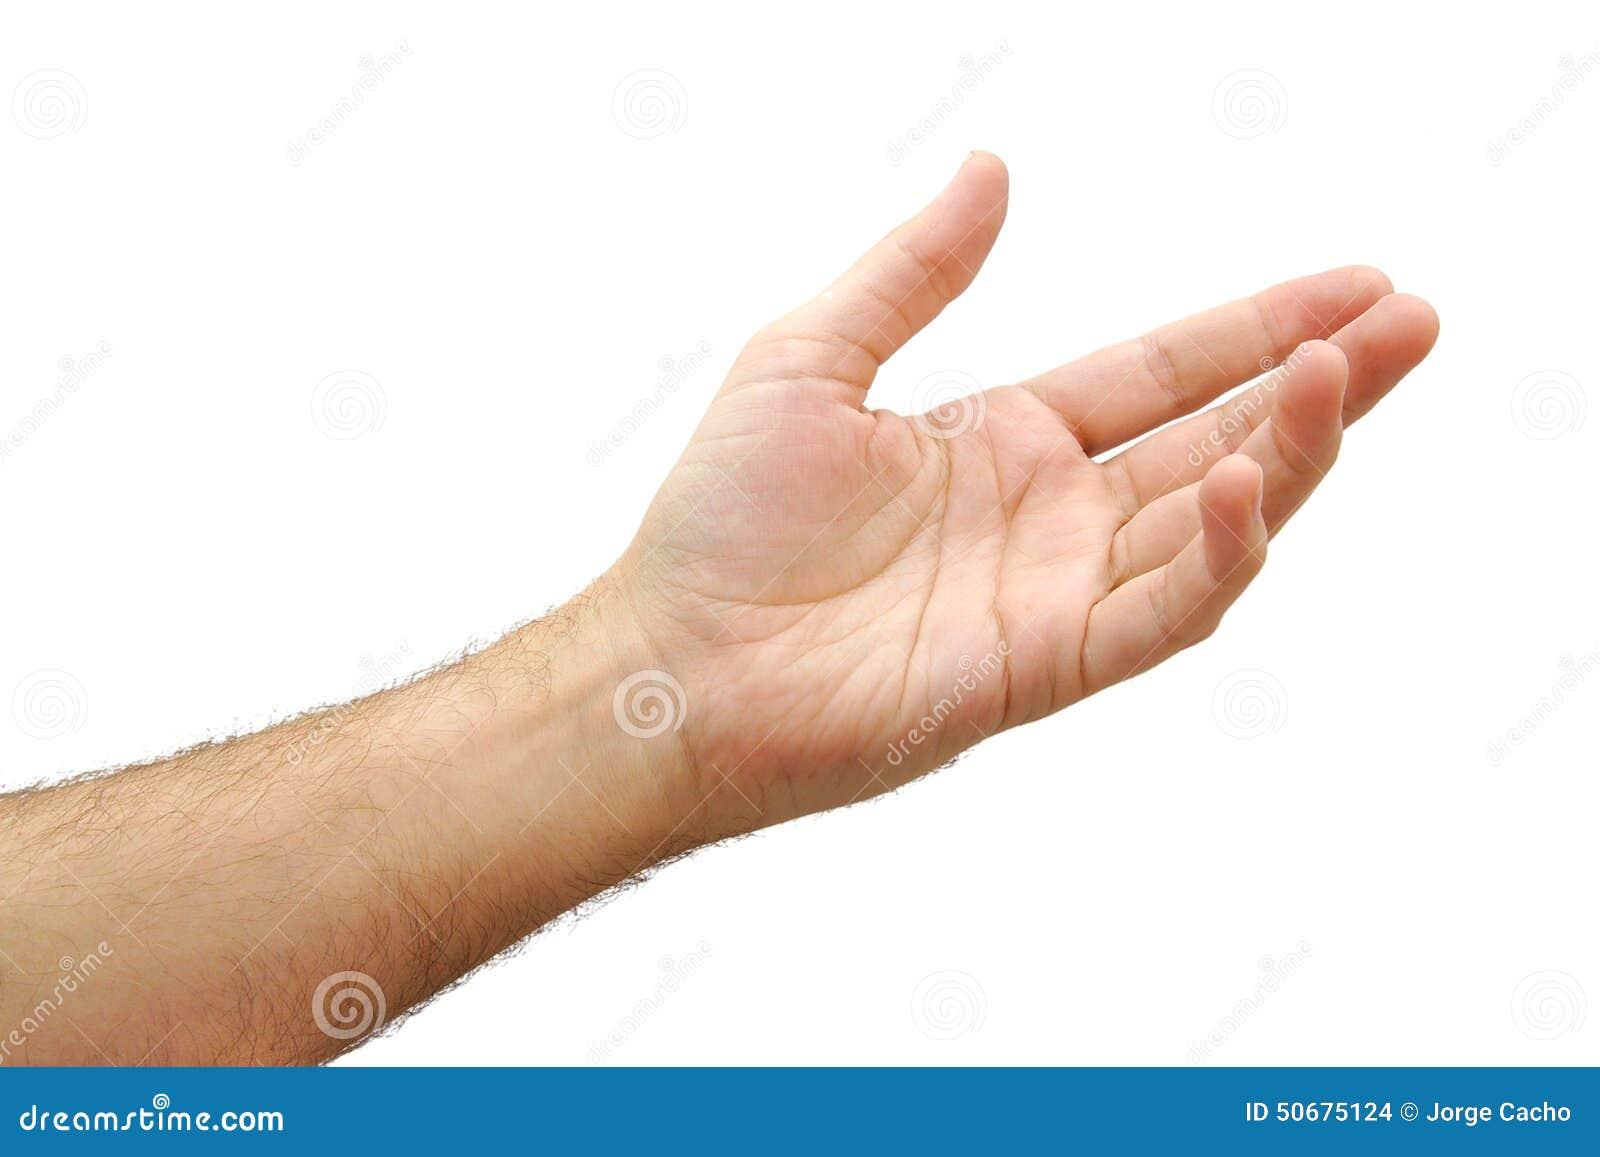 Download 开放人的手和准备好帮助或接受 库存照片. 图片 包括有 打手势, 任何, 背包, 查出, 索引, 白种人 - 50675124